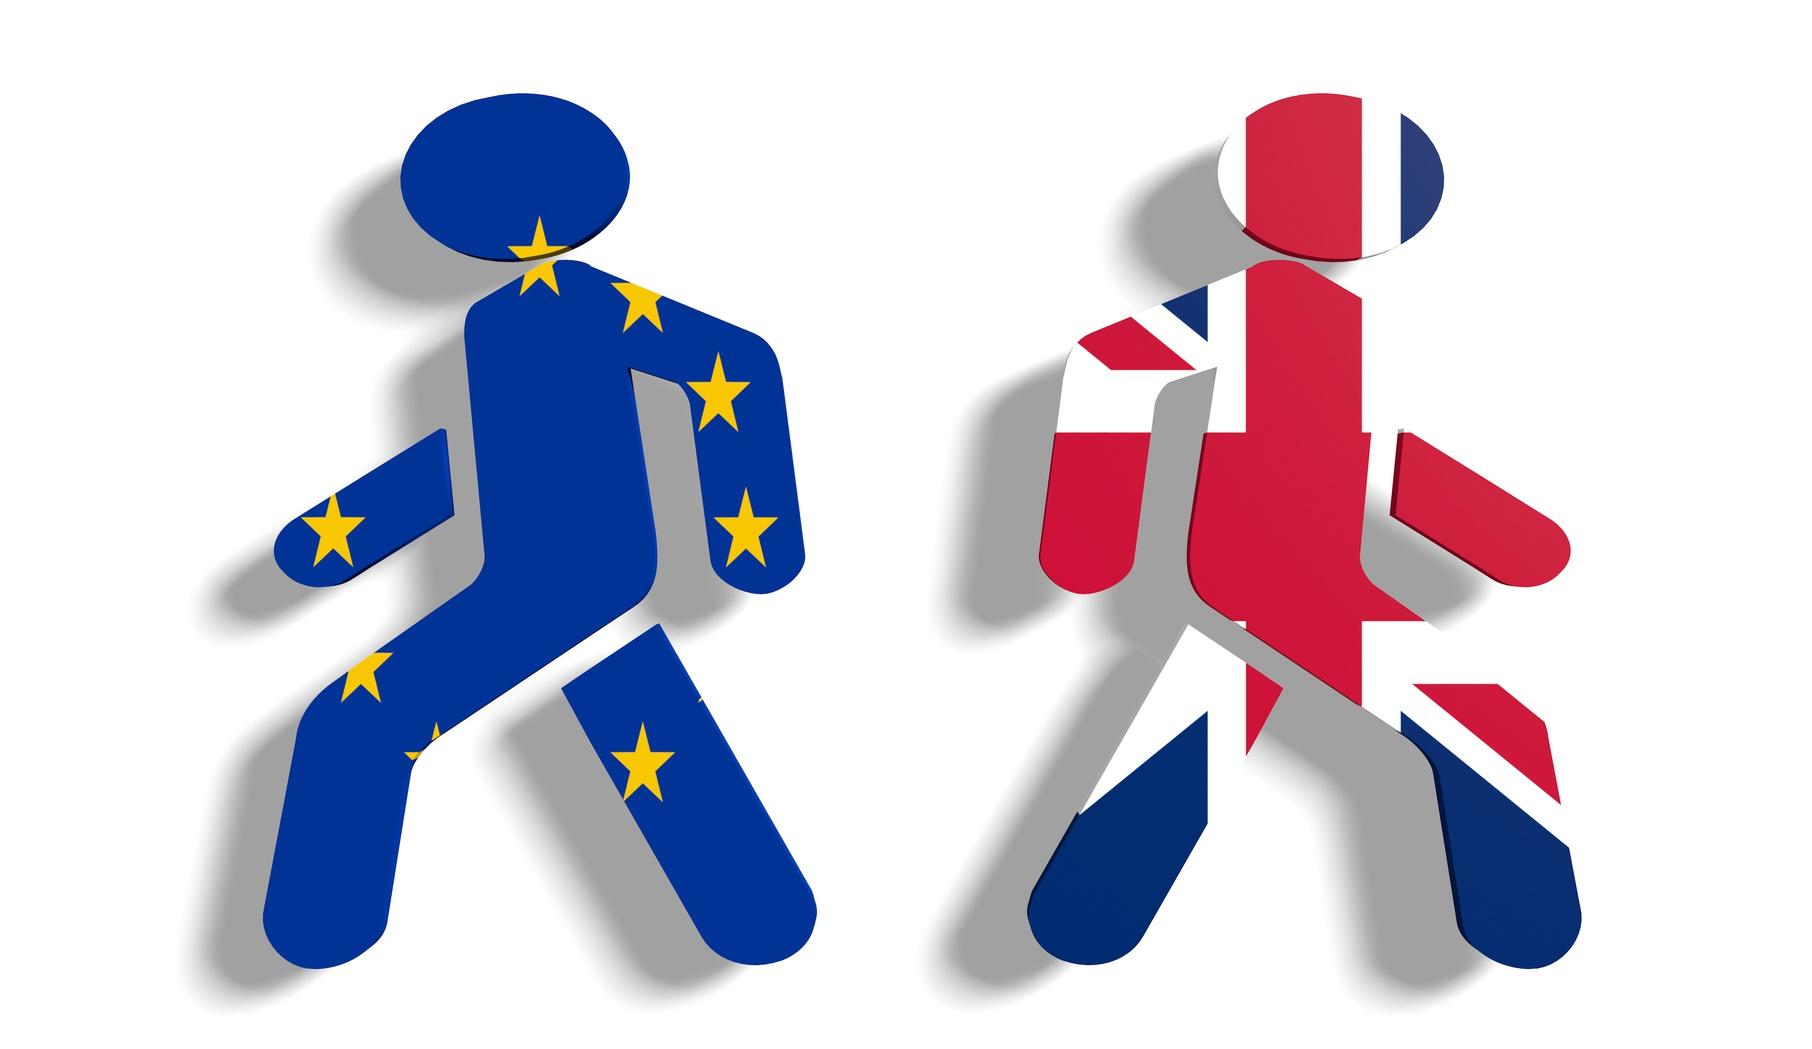 La imagen de masterinvestor.co.uk